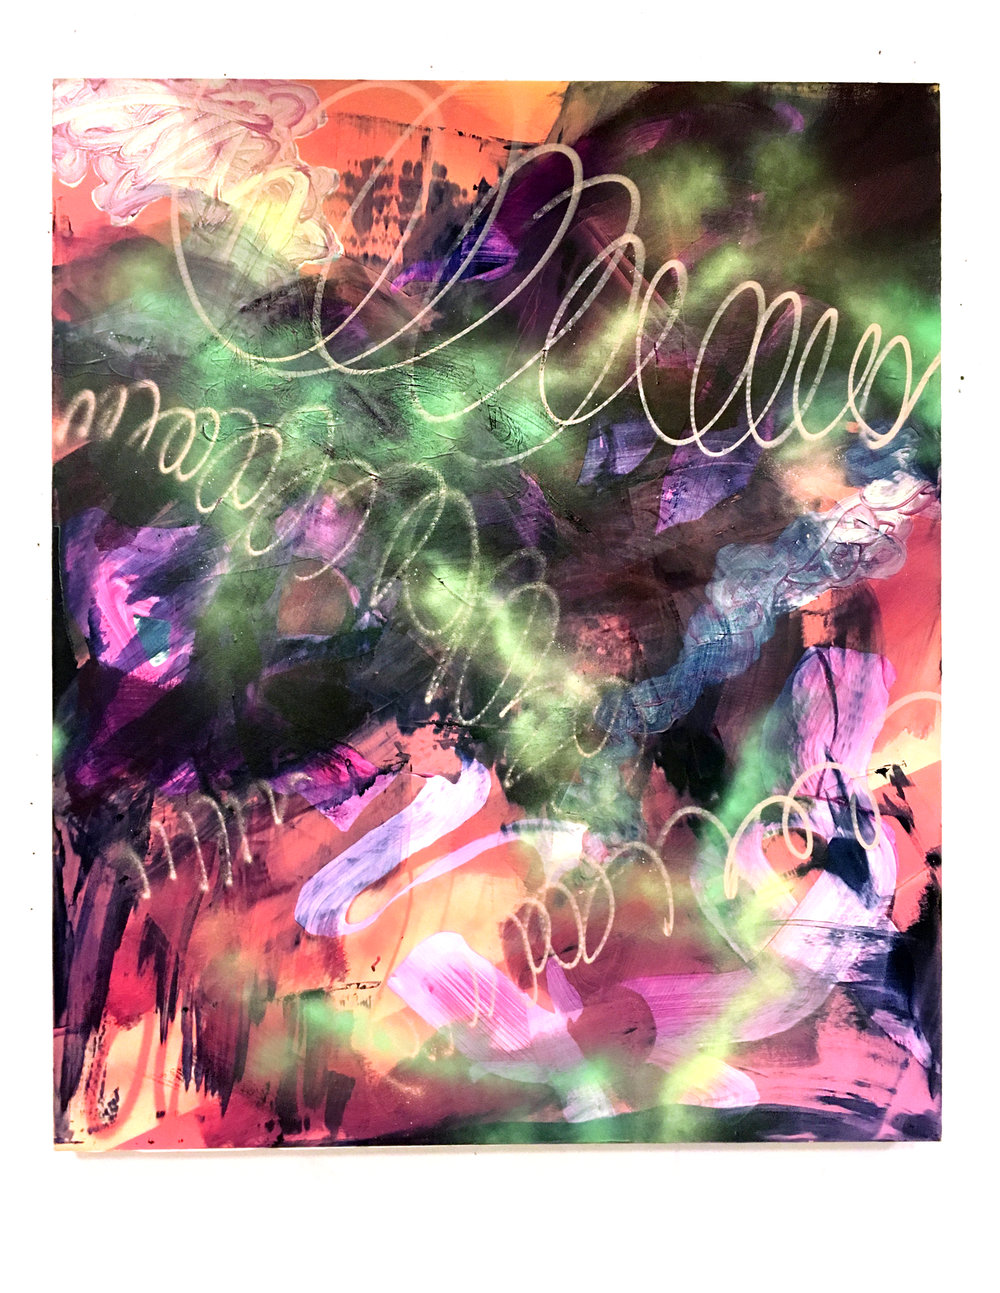 Án titils (Nokkur tungumál) 152x122 cm 2016